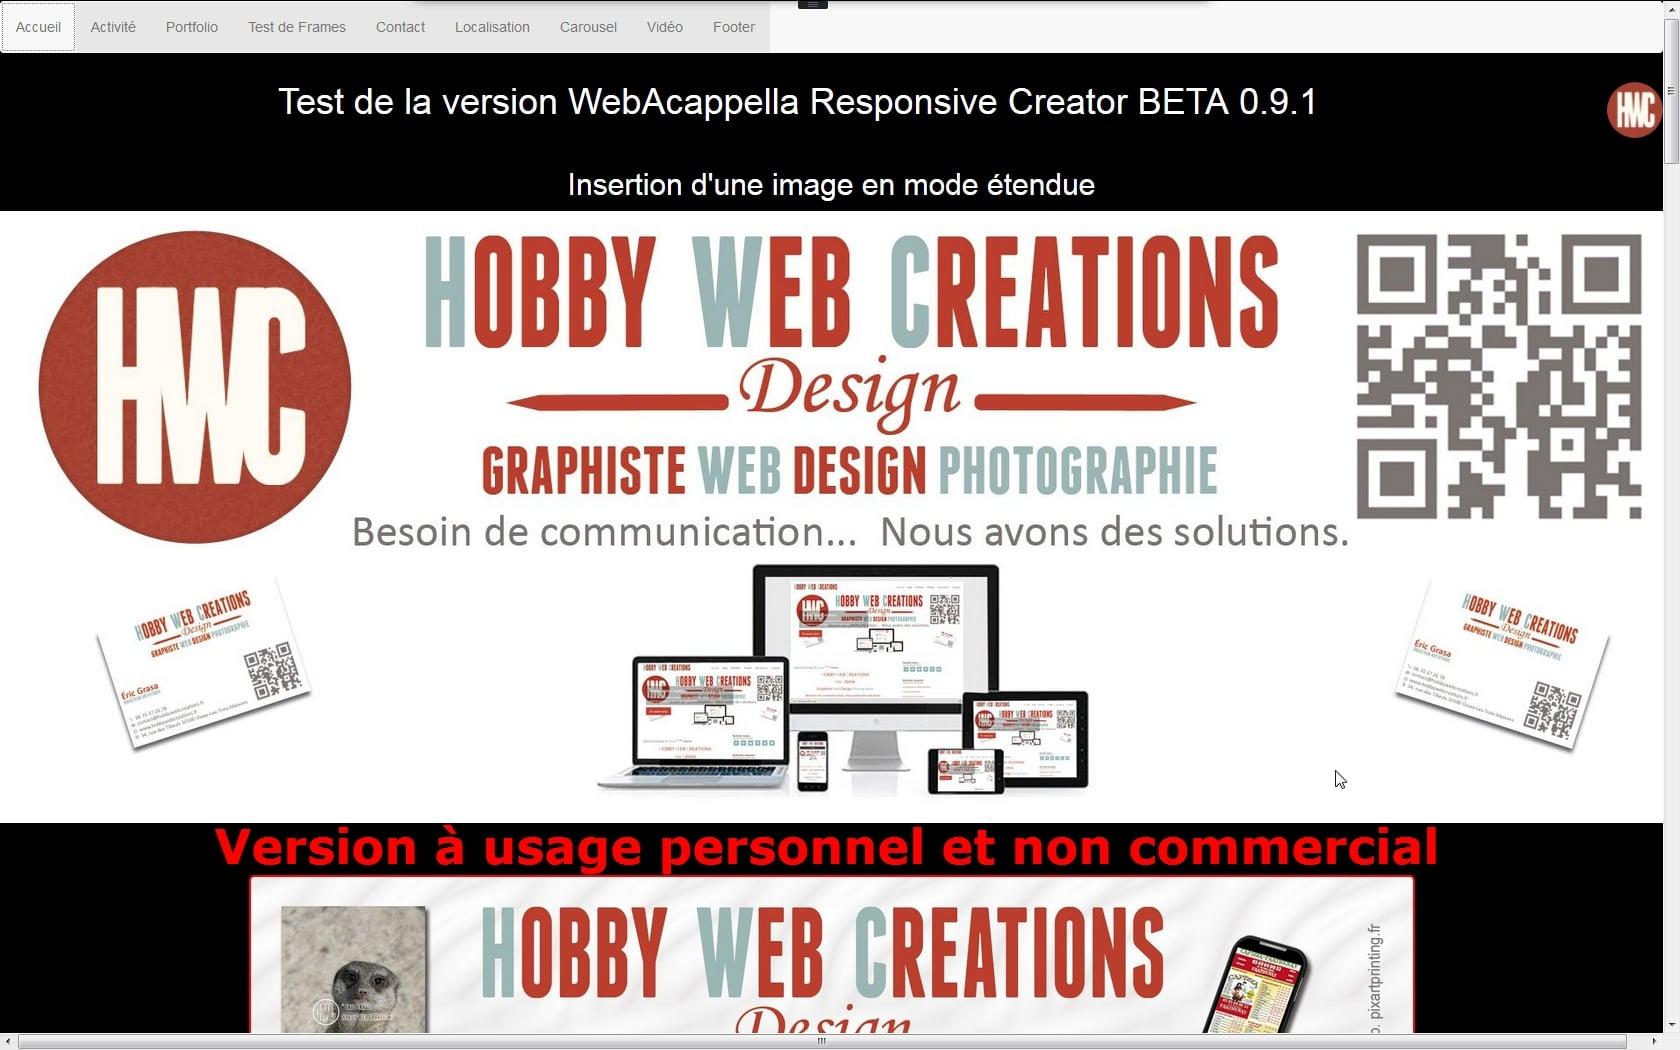 Webacappella responsive creator beta 0 9 1 1 for Copie ecran